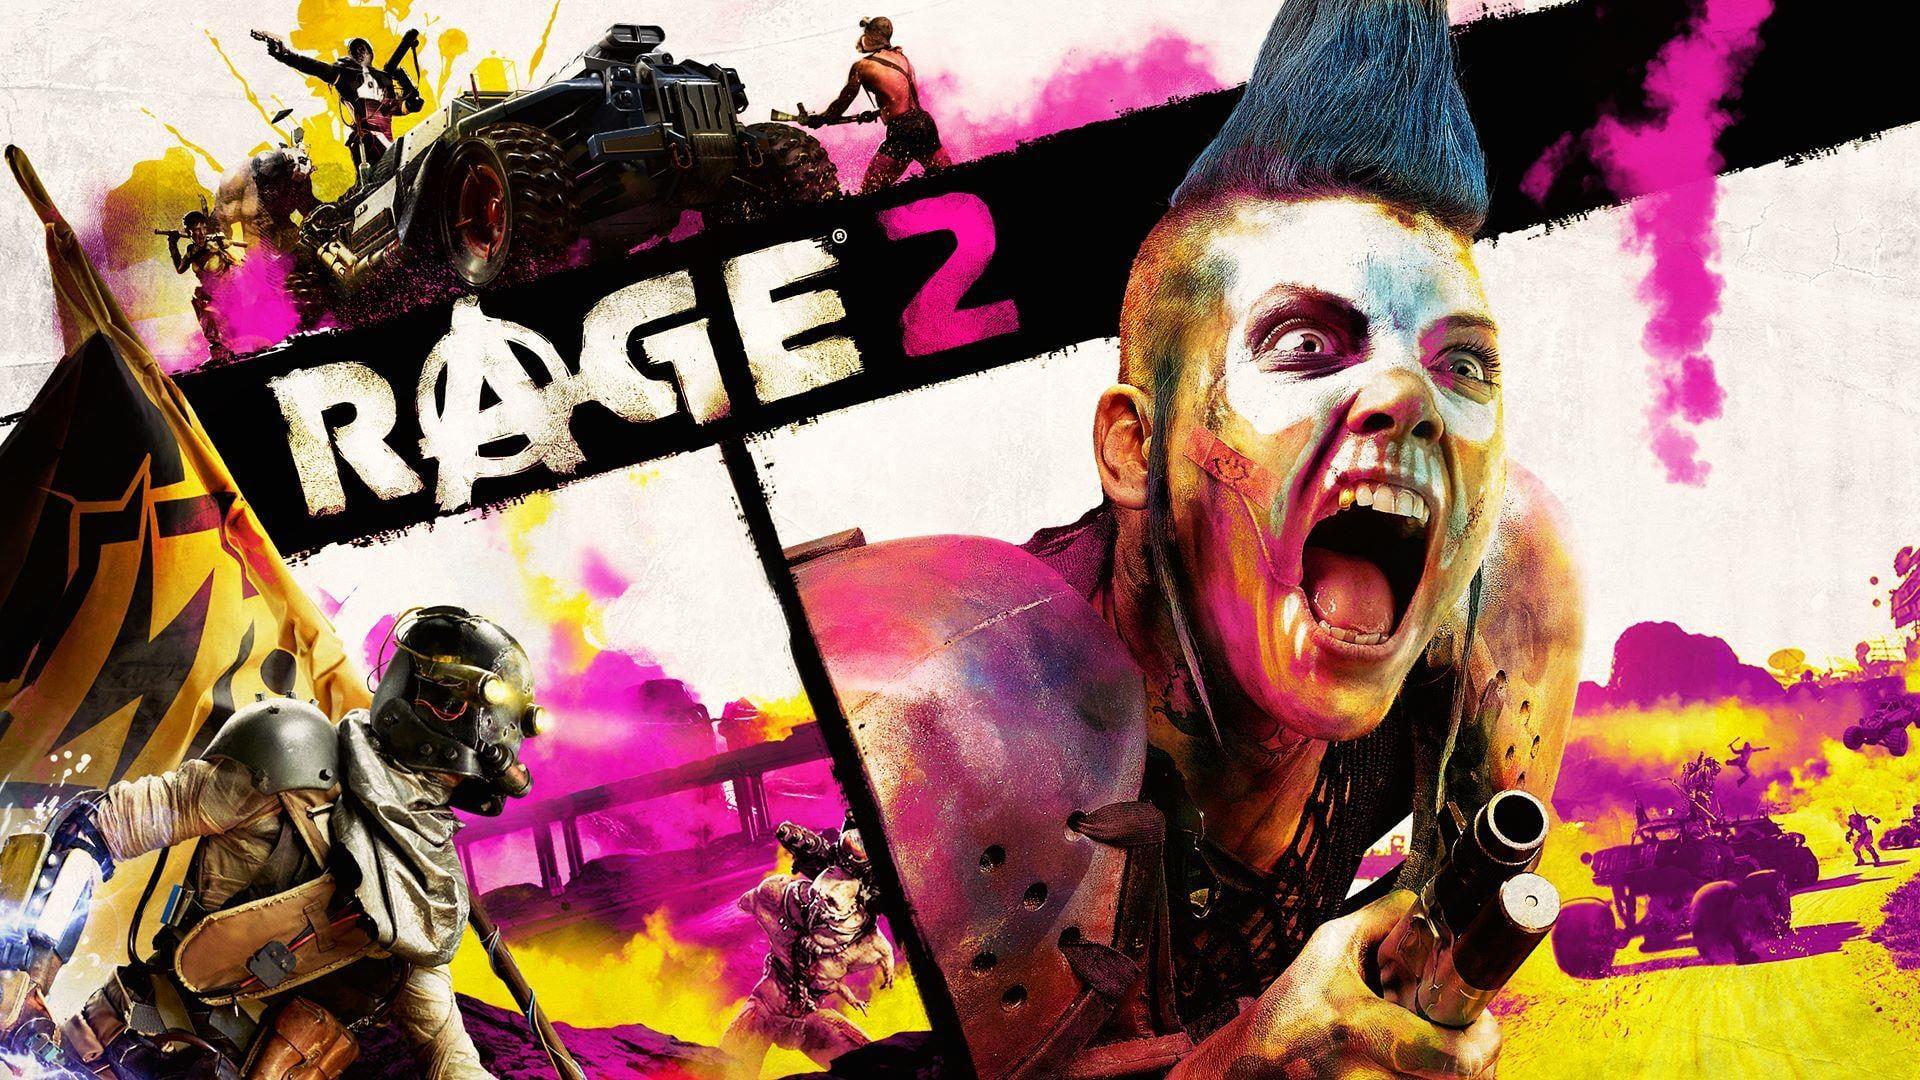 Rage 2 berrikuspena: Rage from Amazing Rage 2'jan